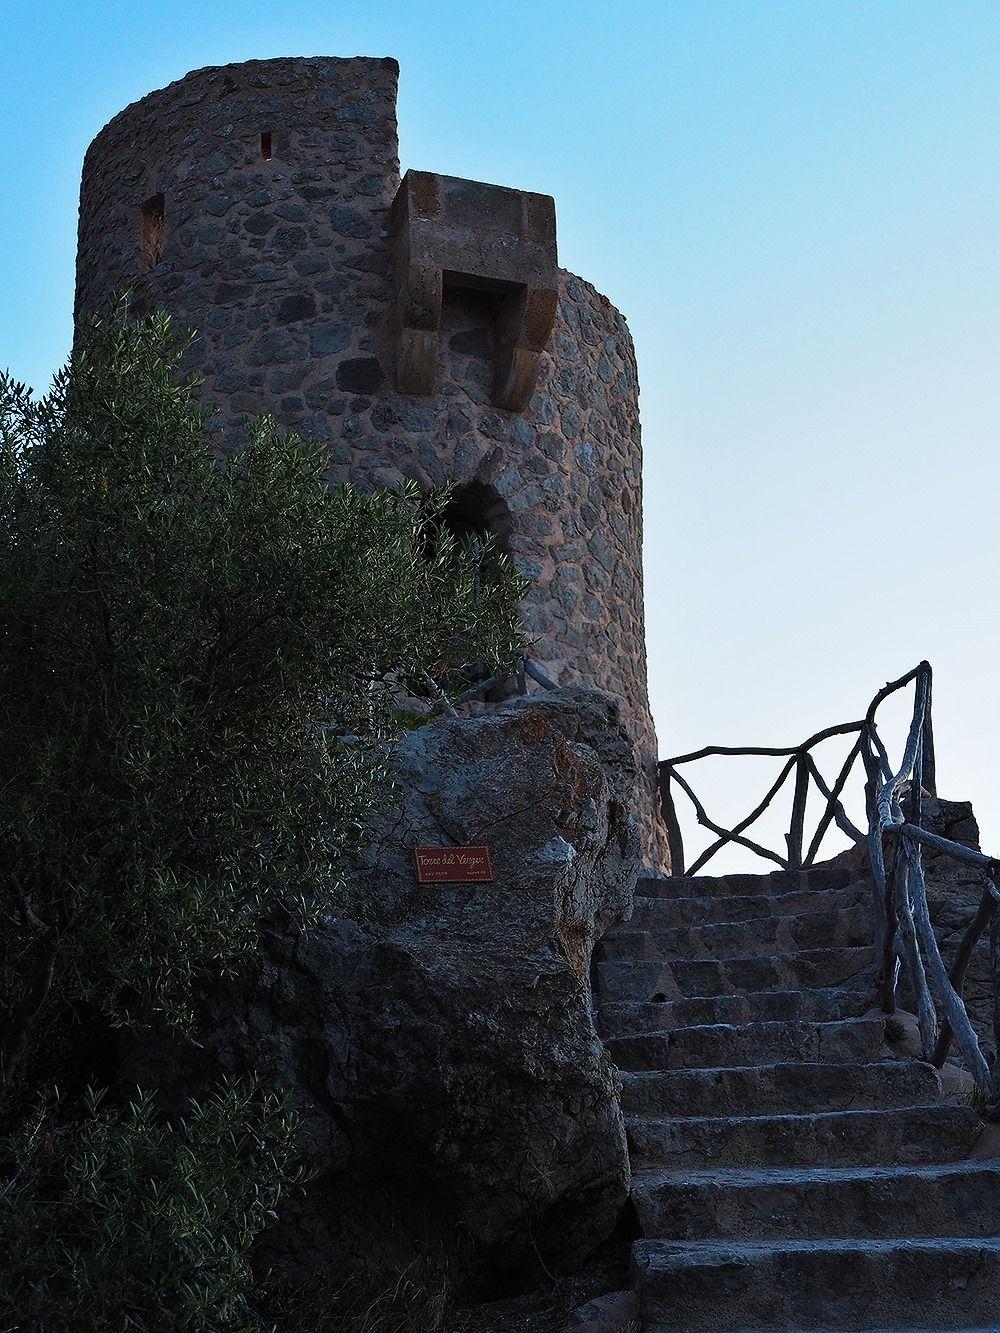 Mallorca-Torre-del-Verger-Aussichtspunkt-Treppe